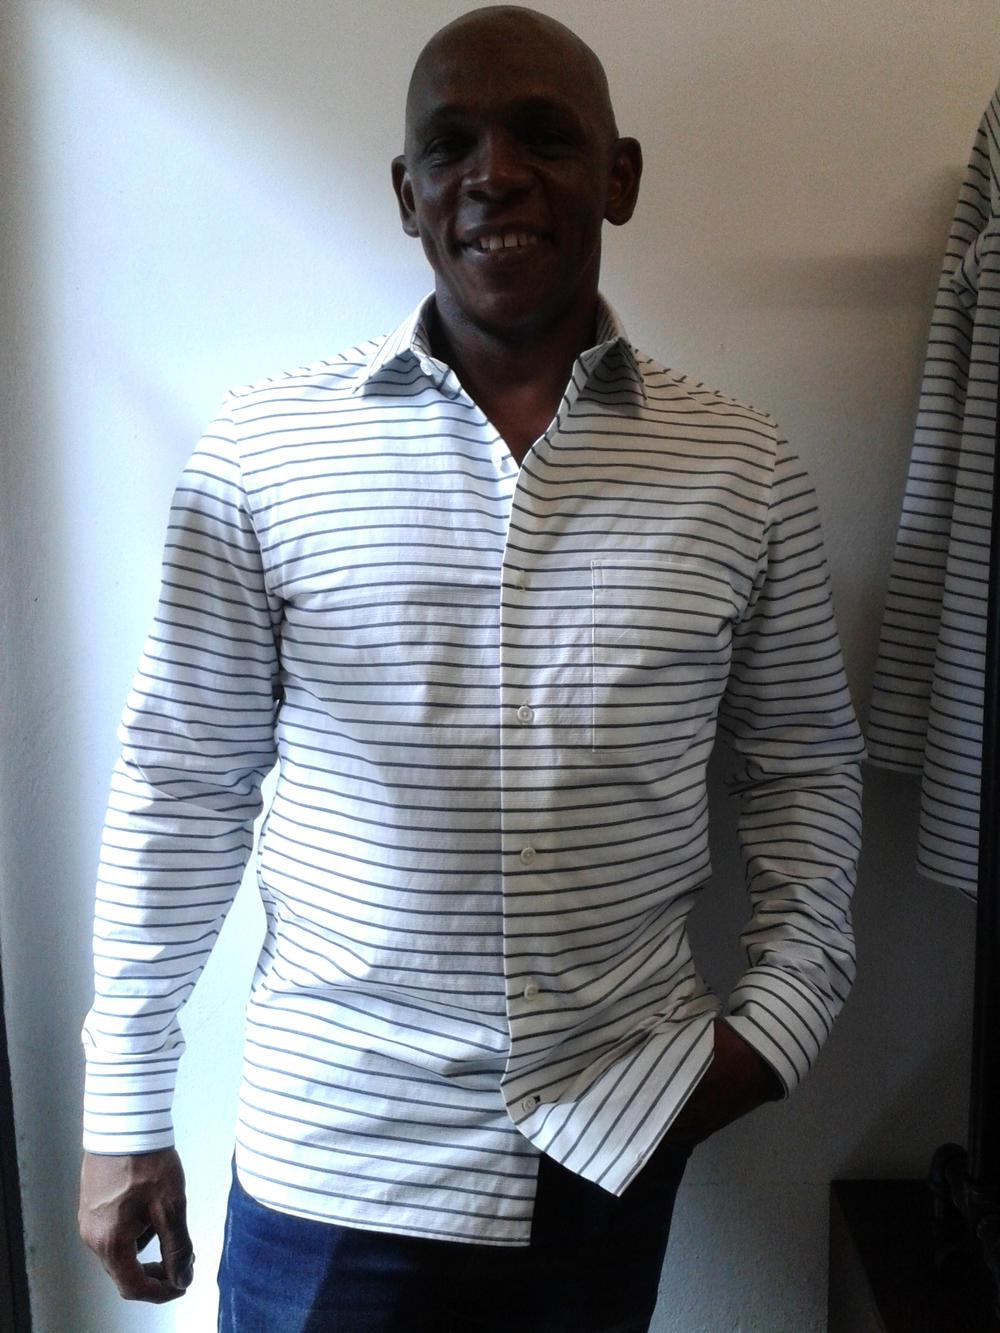 Boat shirt, 100% cotton, Italy